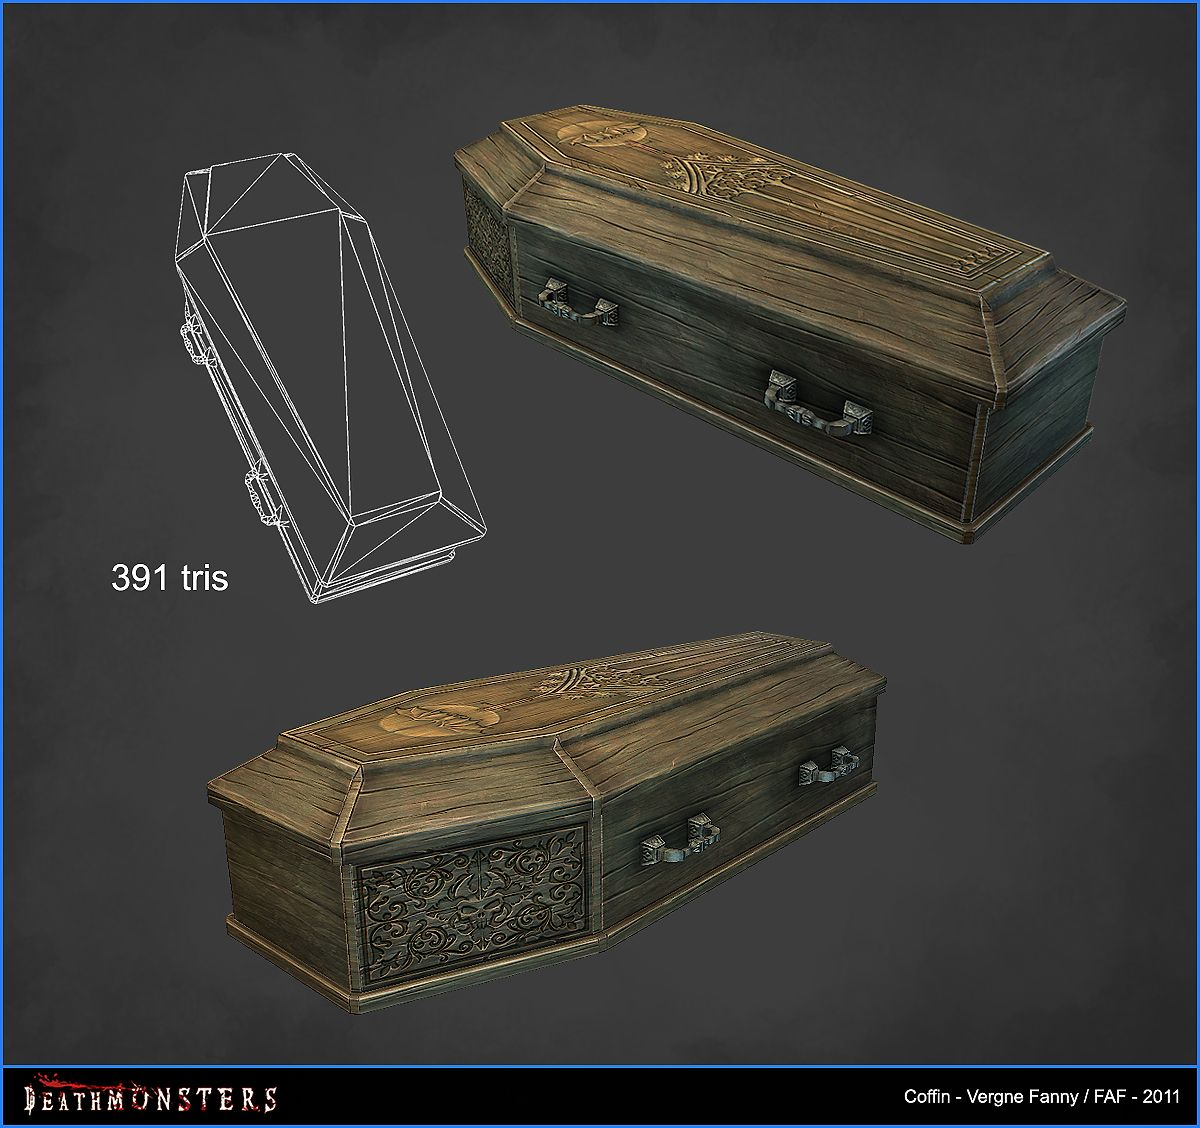 DeathMonsters (2011)       BIRDIES ROADParis FRANCE  Period : 6 months  Realtime Engine : Unity  Plateform : XBox 360   Shown with permiss...